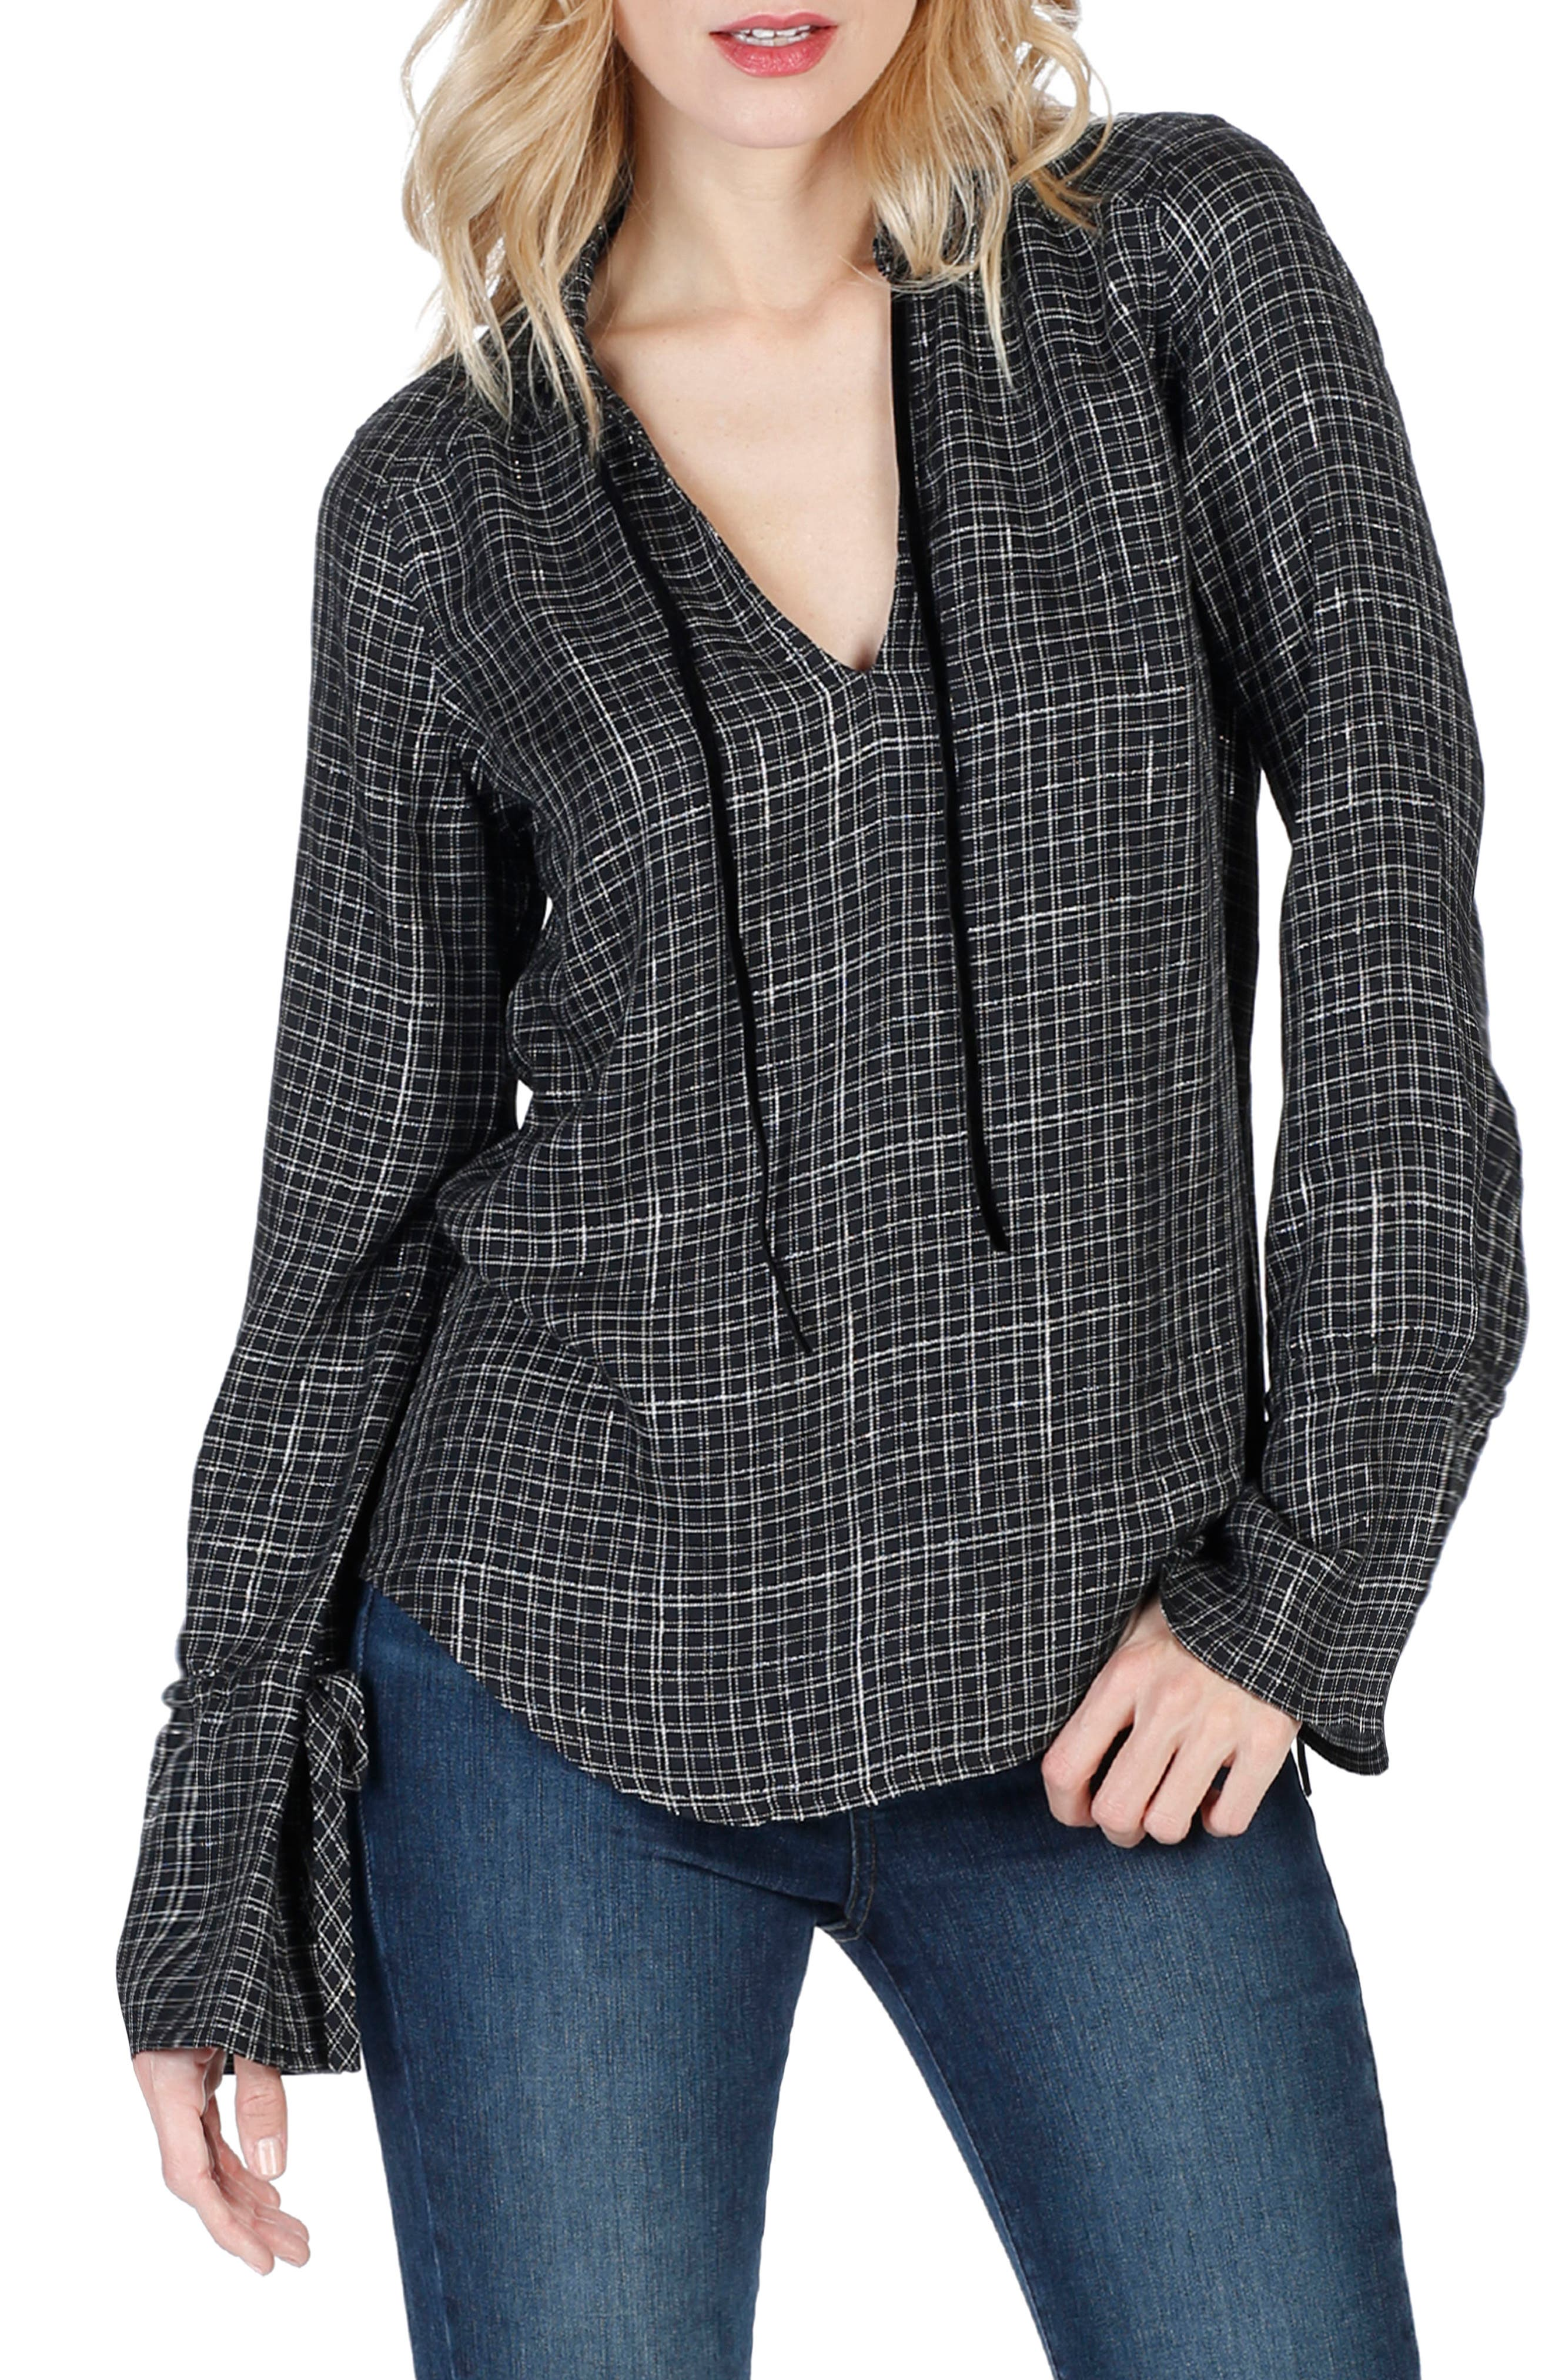 Calissa Shirt,                             Main thumbnail 1, color,                             Black Gunmetal Lurex